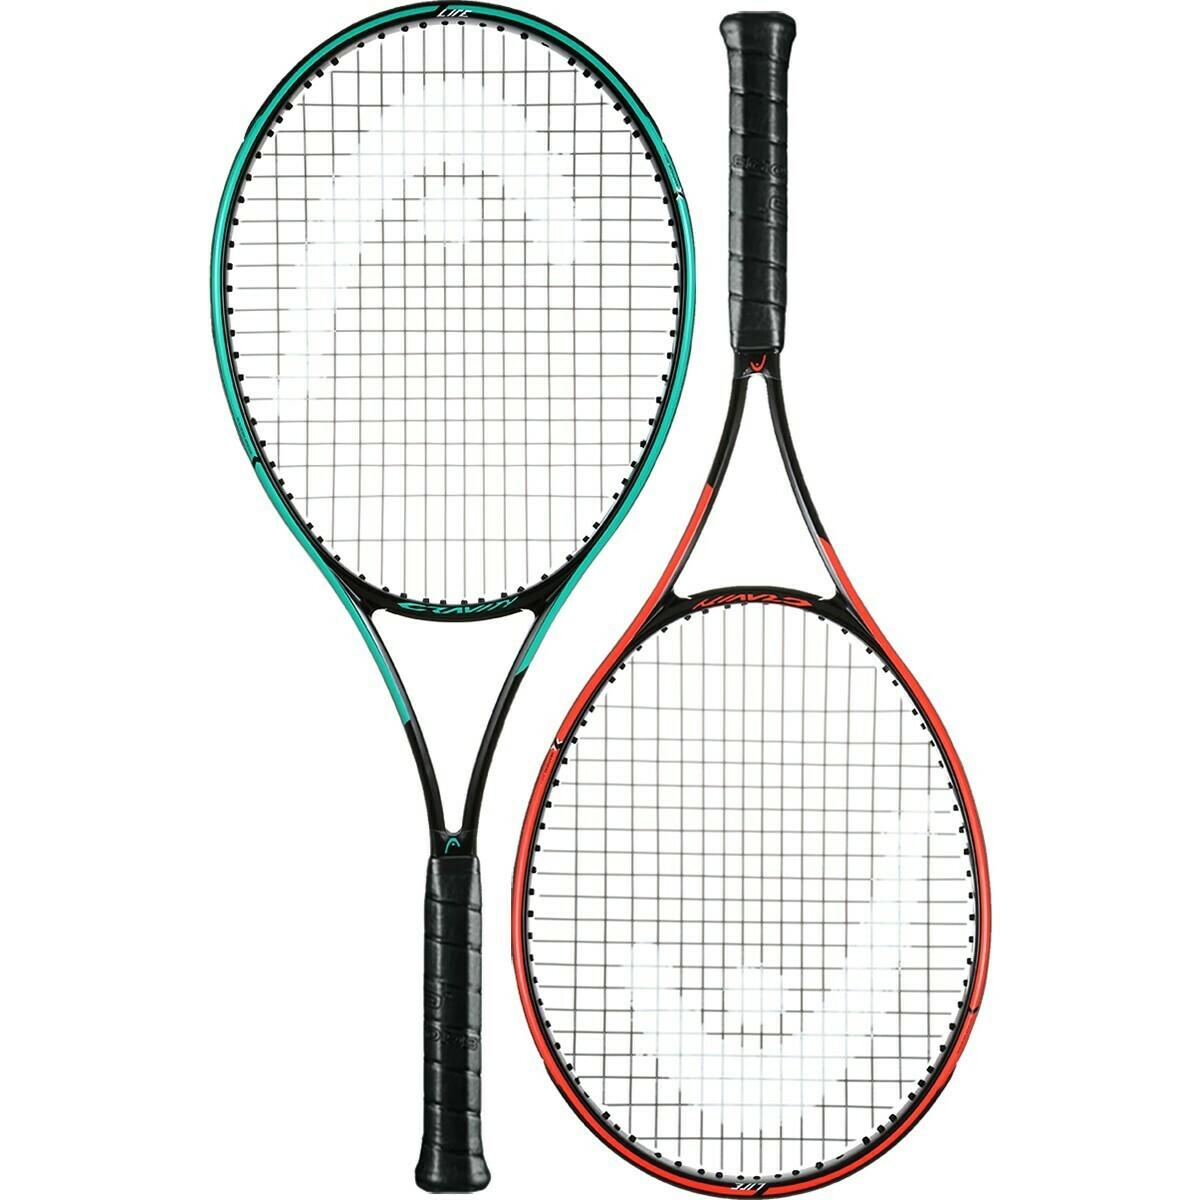 Head Graphene 360 Gravity S racquet 270g 16x20 L1 104in